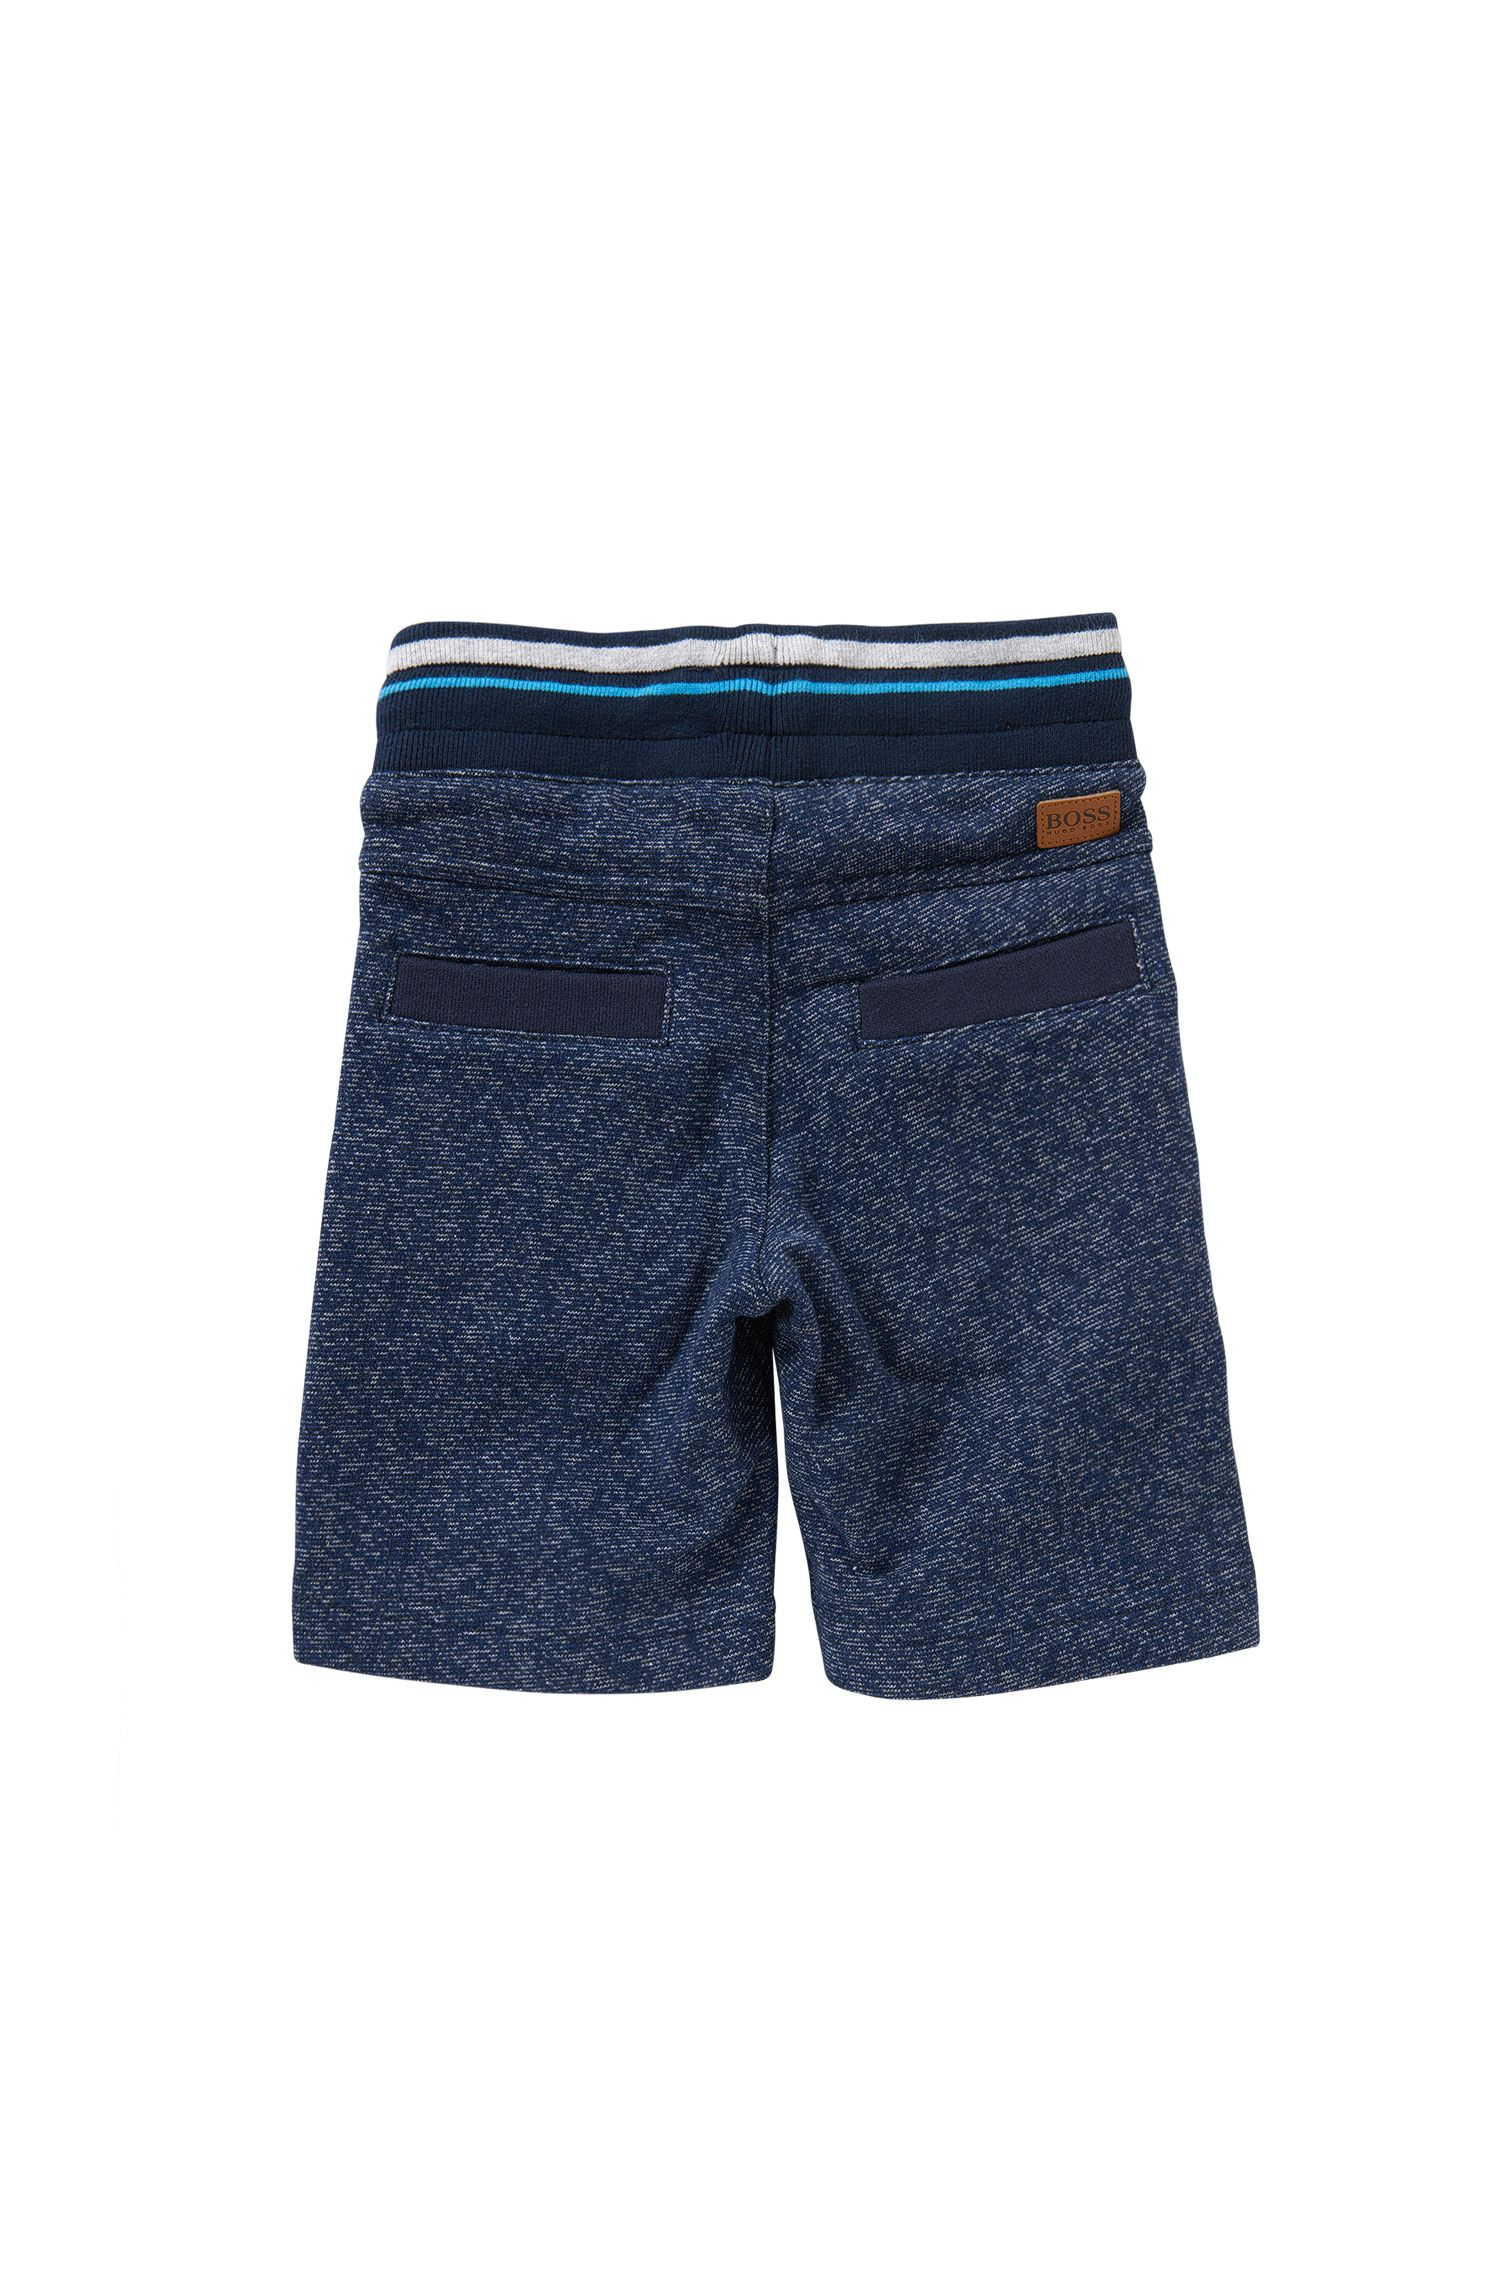 Kids-Sweathose aus Baumwolle mit Tunnelzug: 'J24385'